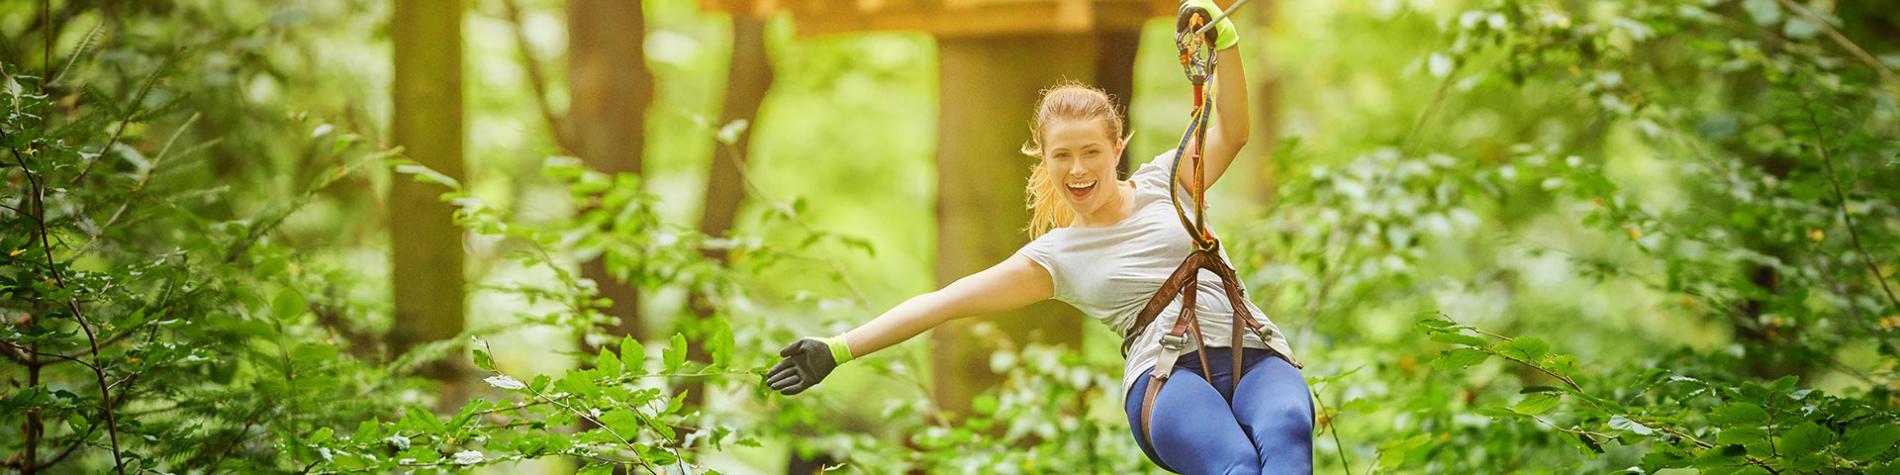 SpaForest - Parc aventure en Ardenne - accrobranche